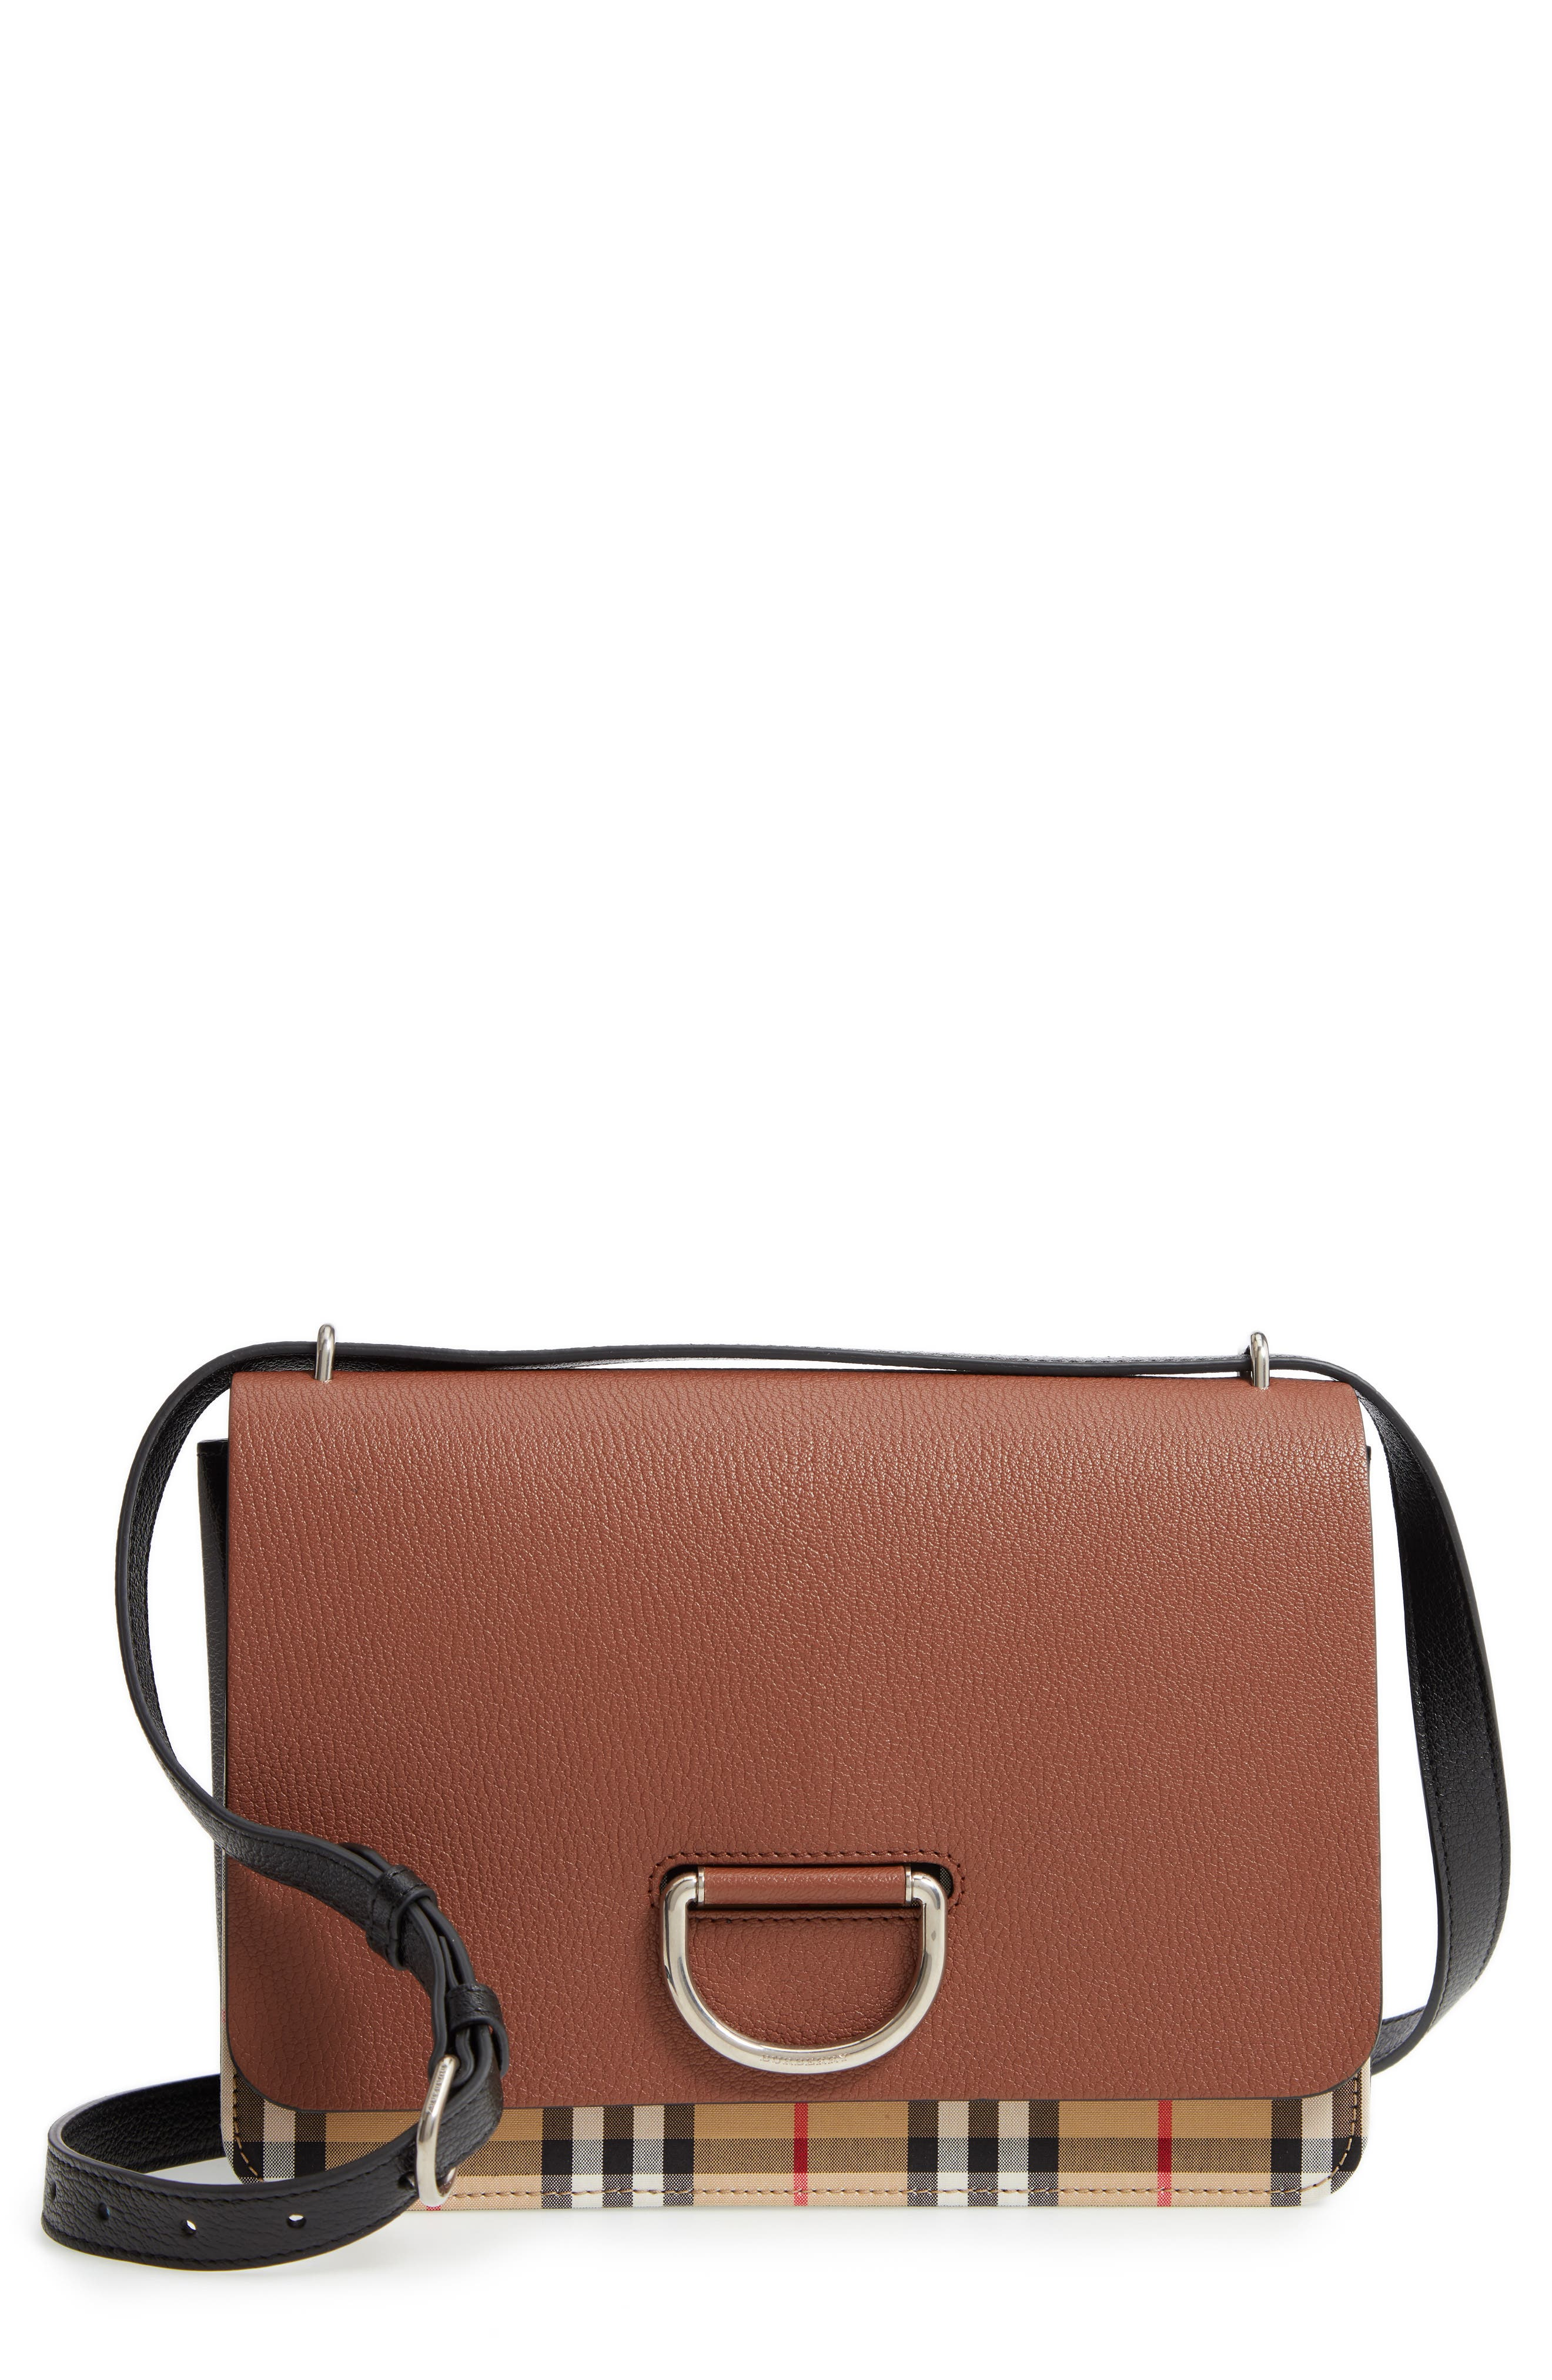 Medium D-Ring Vintage Check & Leather Crossbody Bag, Main, color, TAN/ BLACK